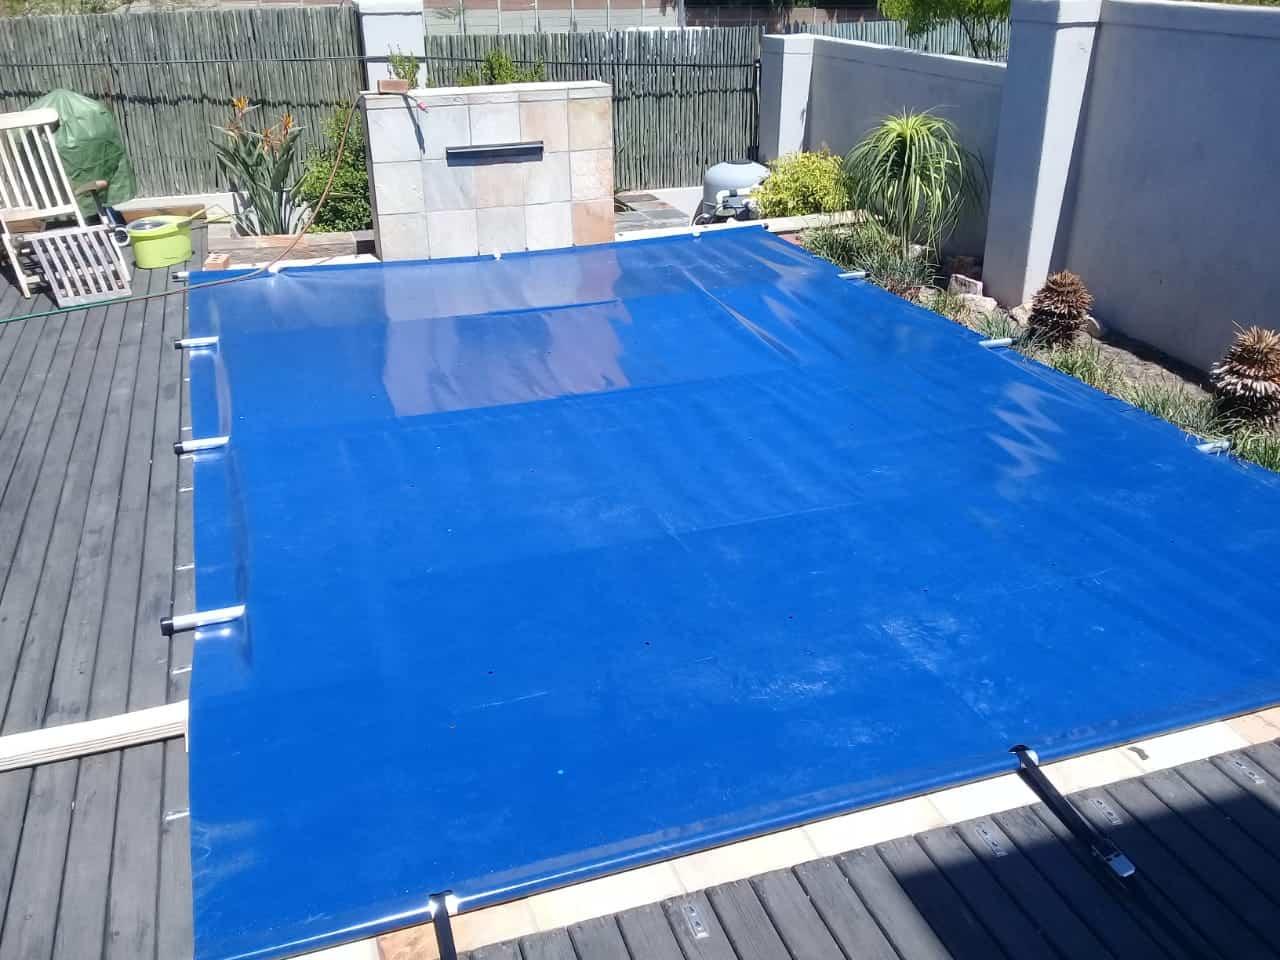 Pool Covers, Pool Covers, Pool Covers Cape Town, Pool Covers Cape Town